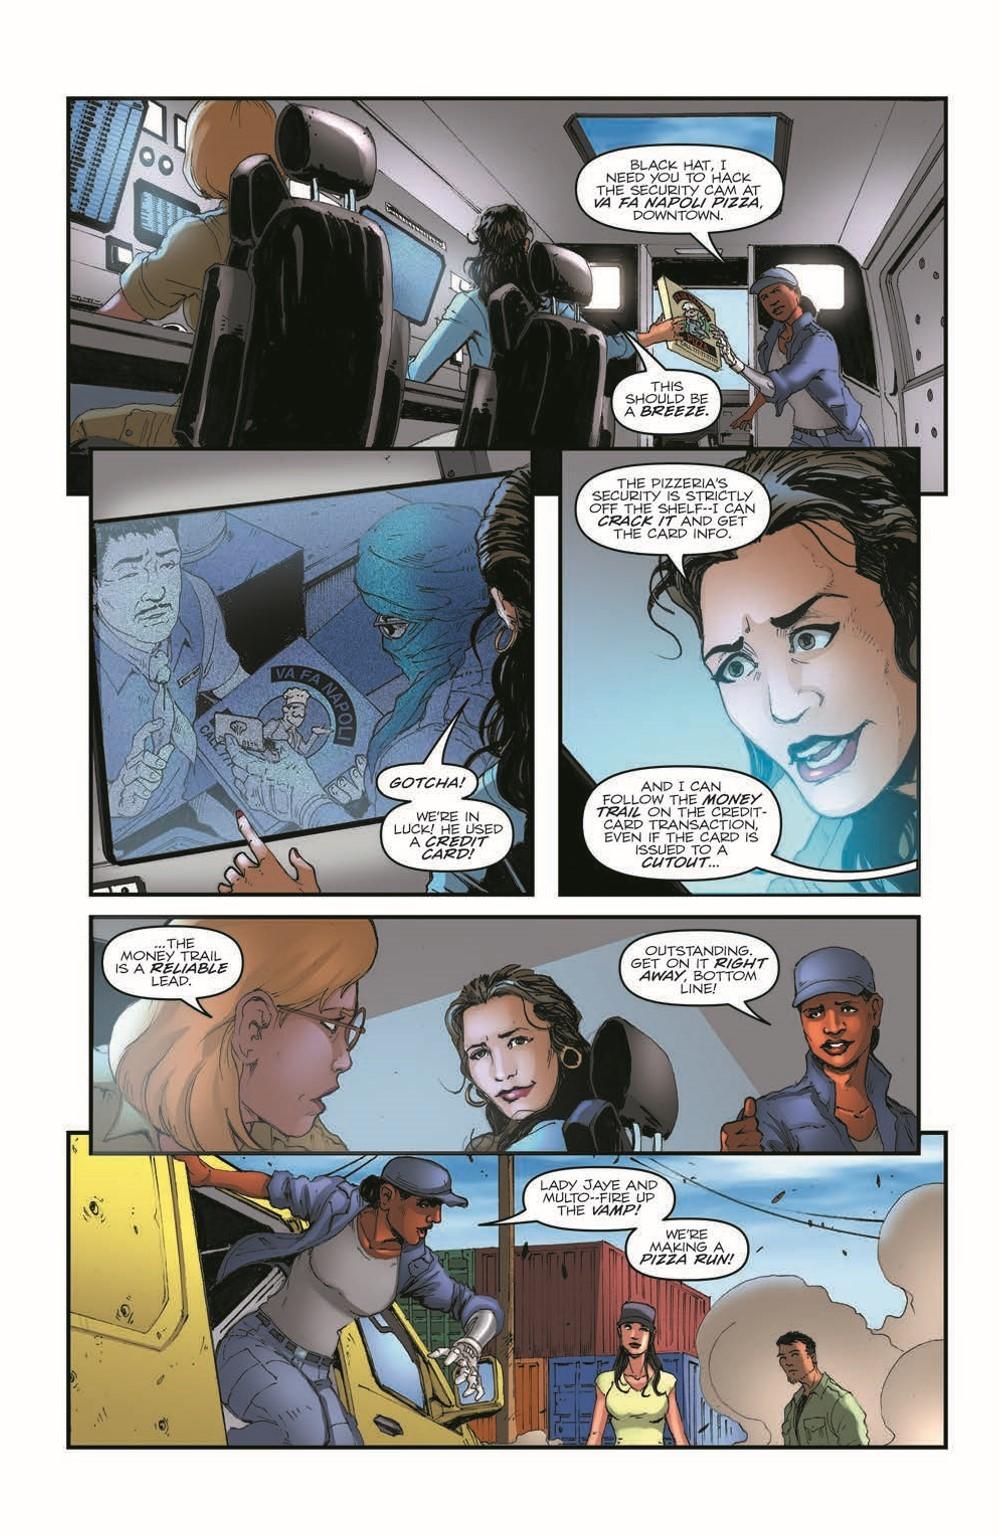 GIJoeRAH284-pr-7 ComicList Previews: G.I. JOE A REAL AMERICAN HERO #284